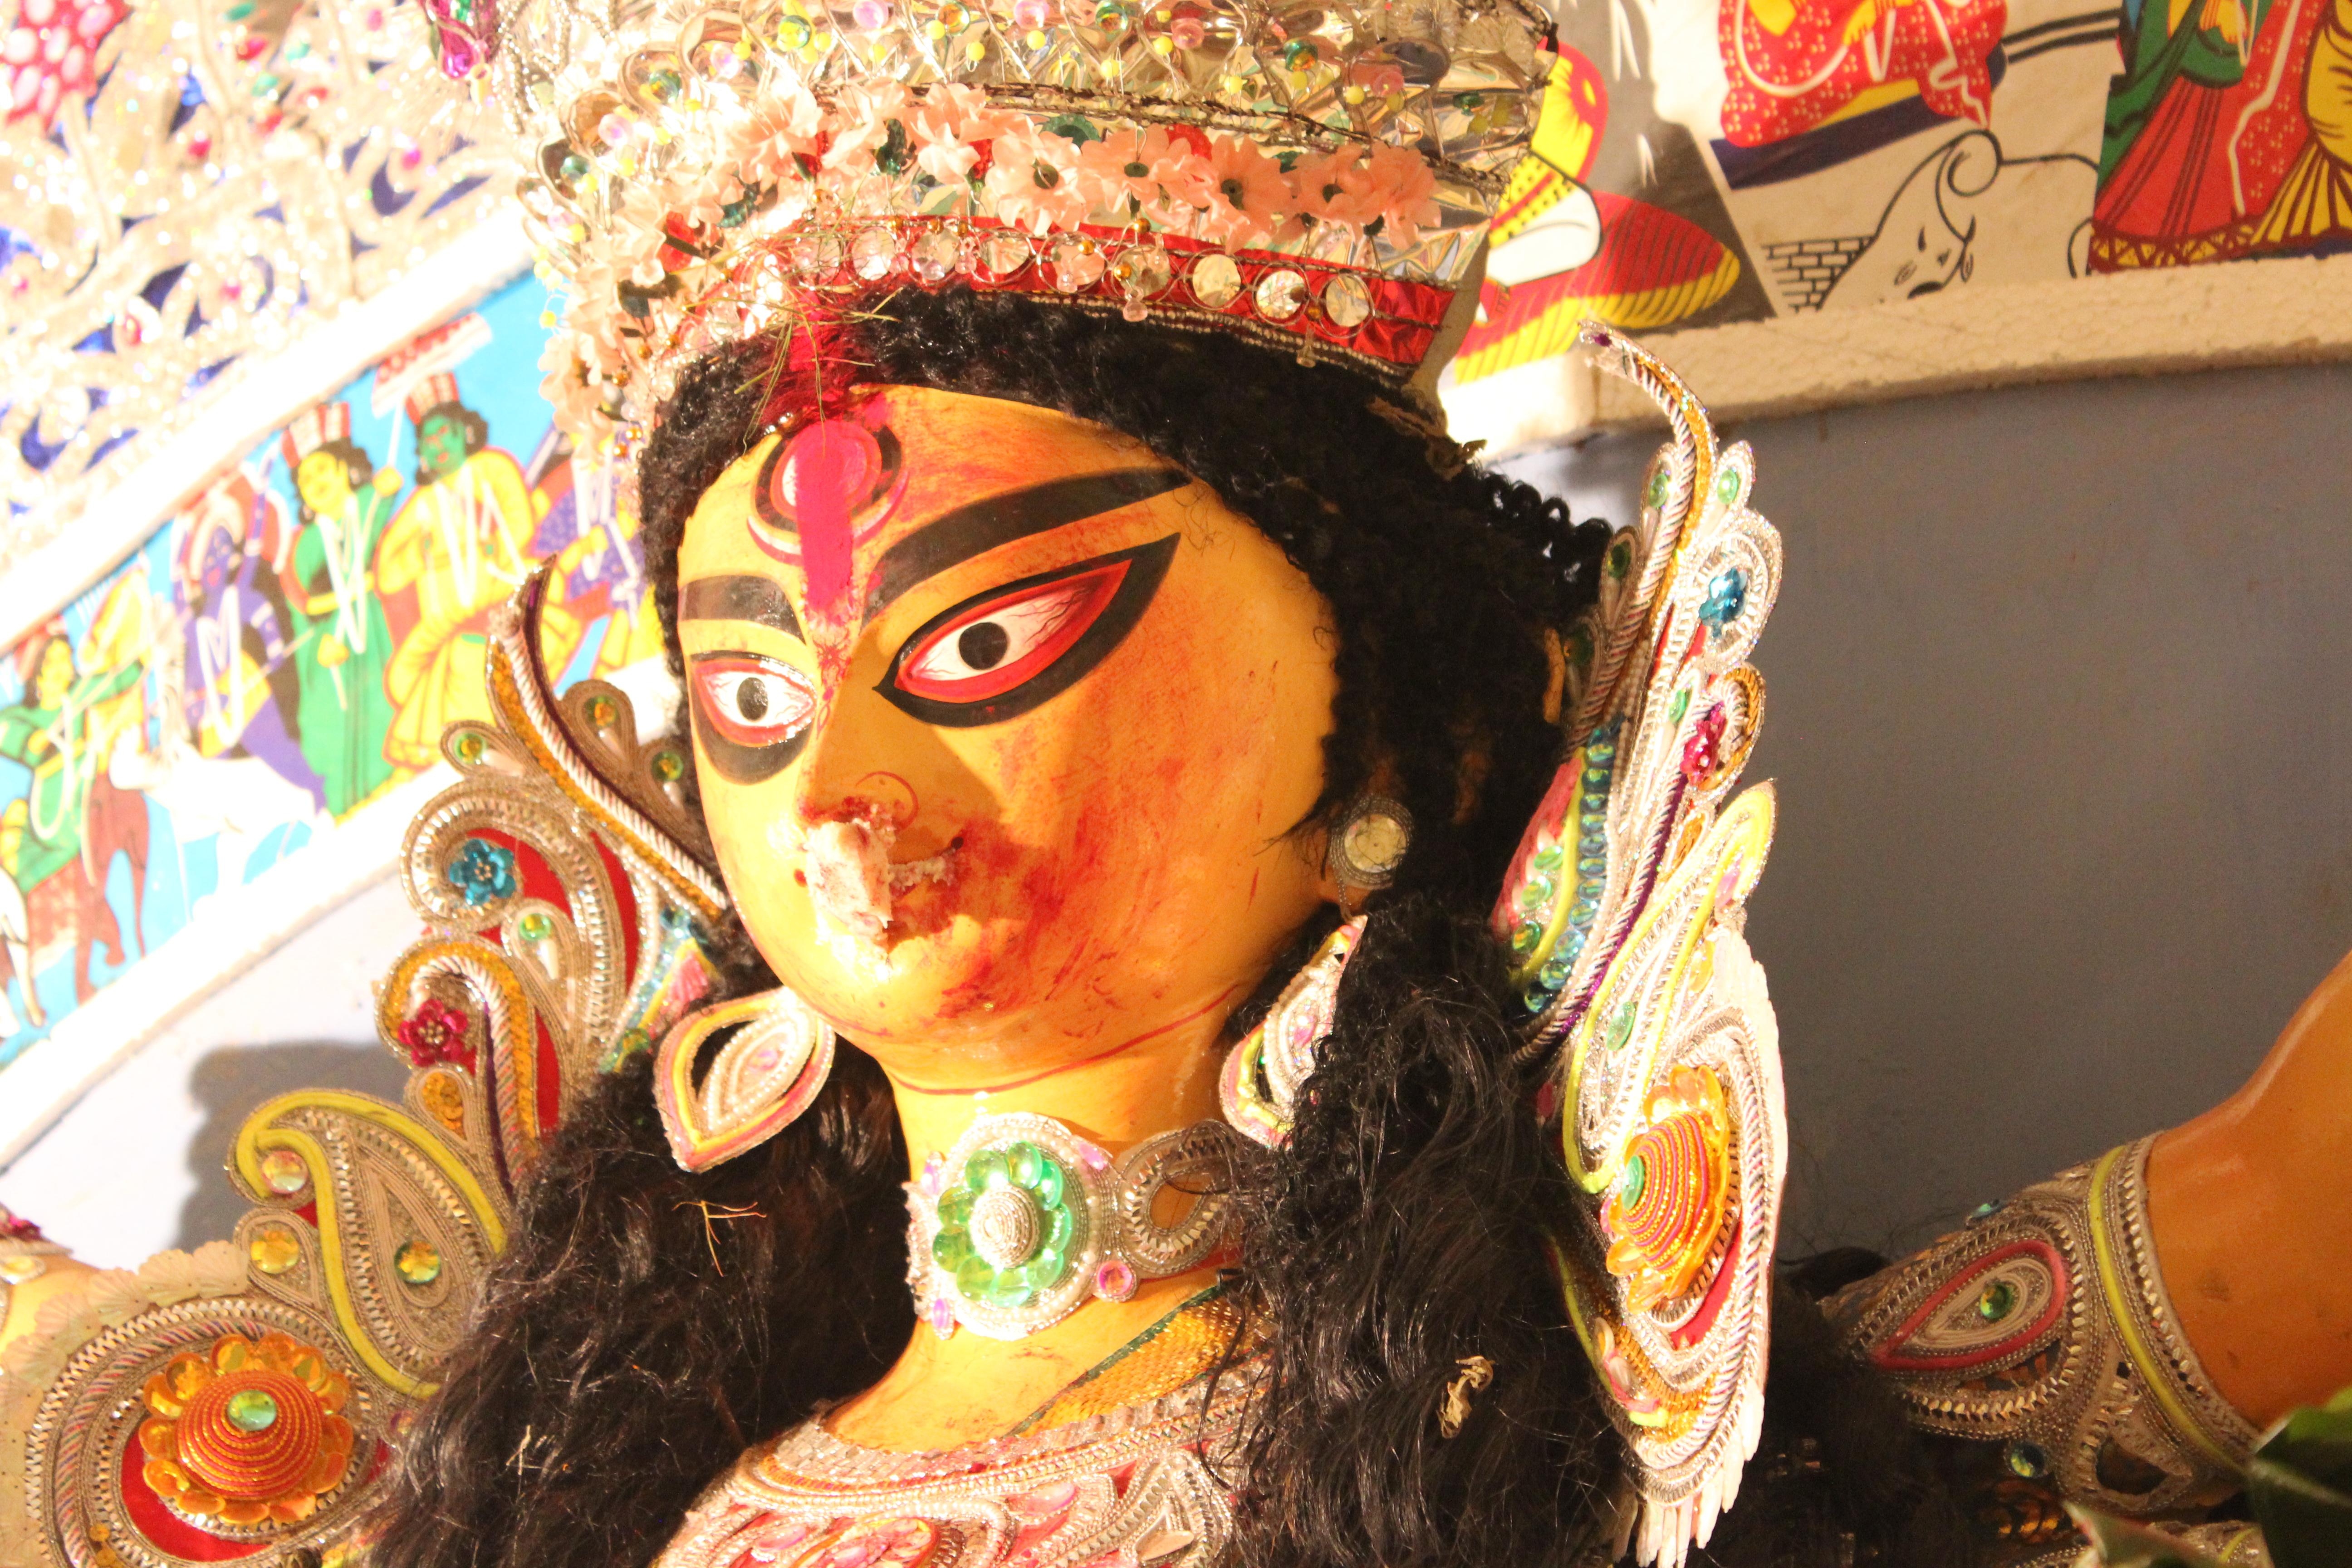 Boron and Visarjan - Bidding Adieu to the Goddess Durga